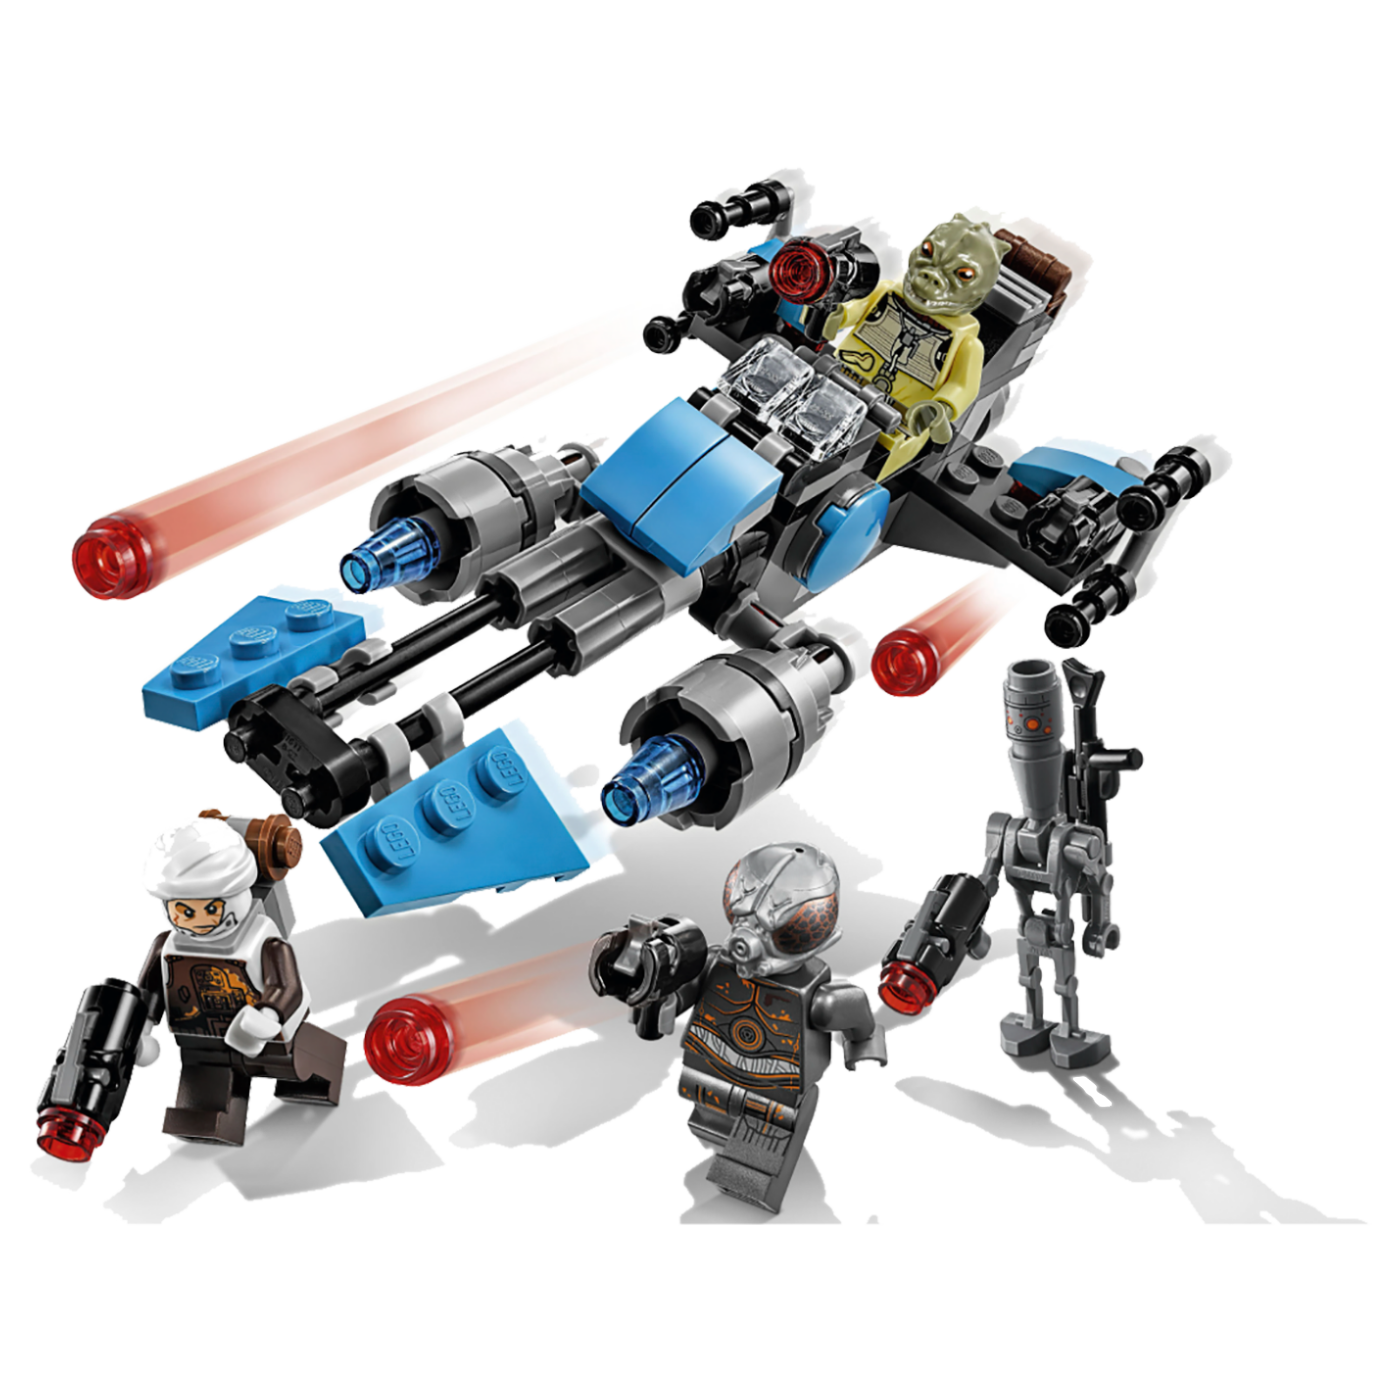 Borbeni komplet,Bounty Hunter Speeder Bike, LEGO Star Wars